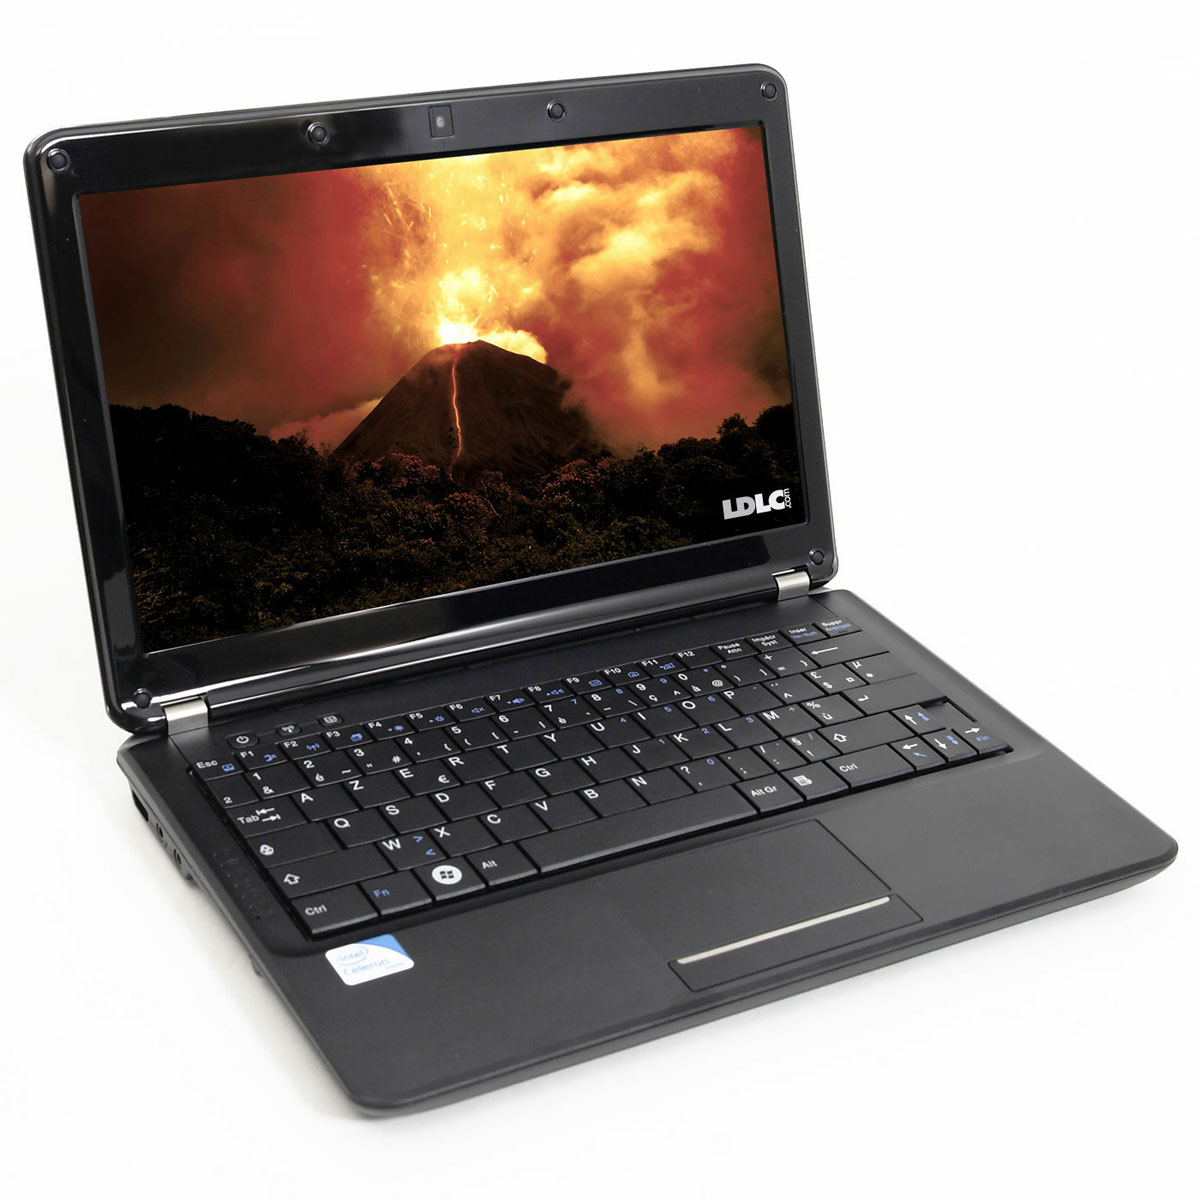 "PC portable LDLC Vulcain SM1-2-H50 Intel Celeron Dual-Core SU2300 2 Go 500 Go 11.6"" LCD Wi-Fi N Webcam (sans OS)"